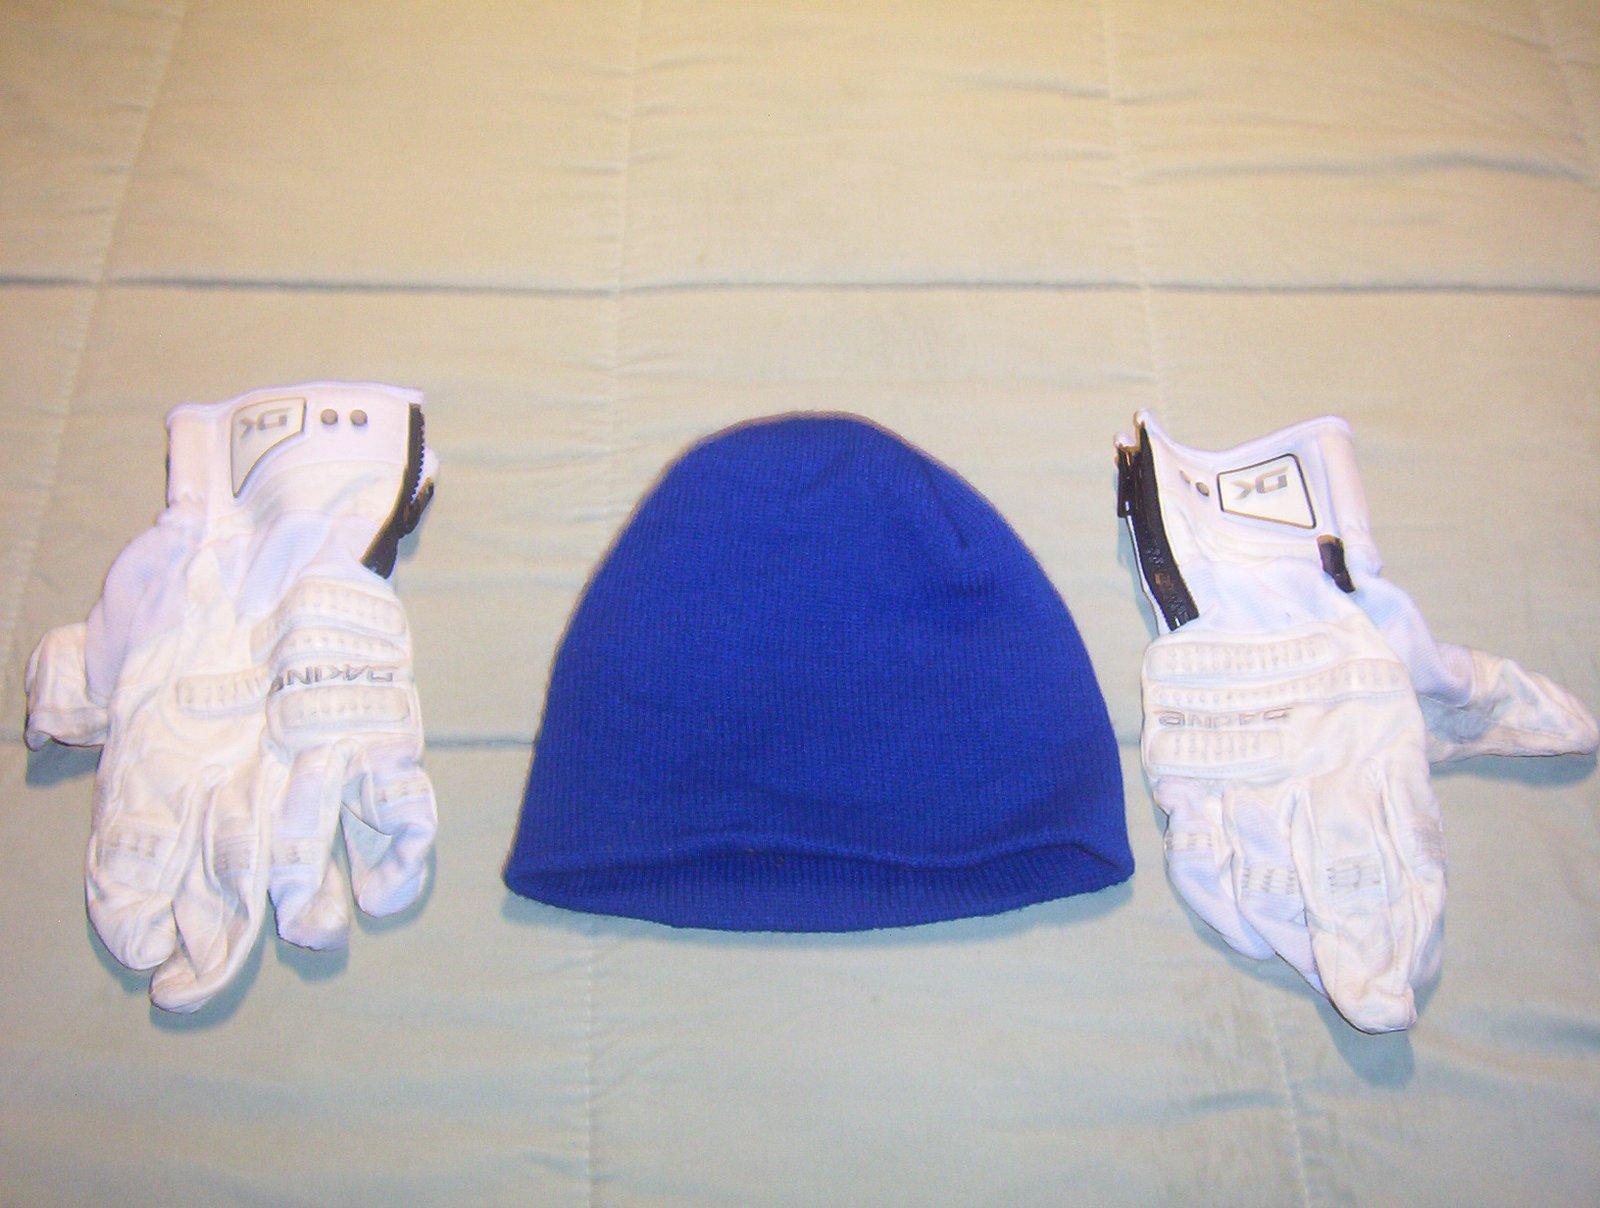 Dakine Gloves and Blue Beanie